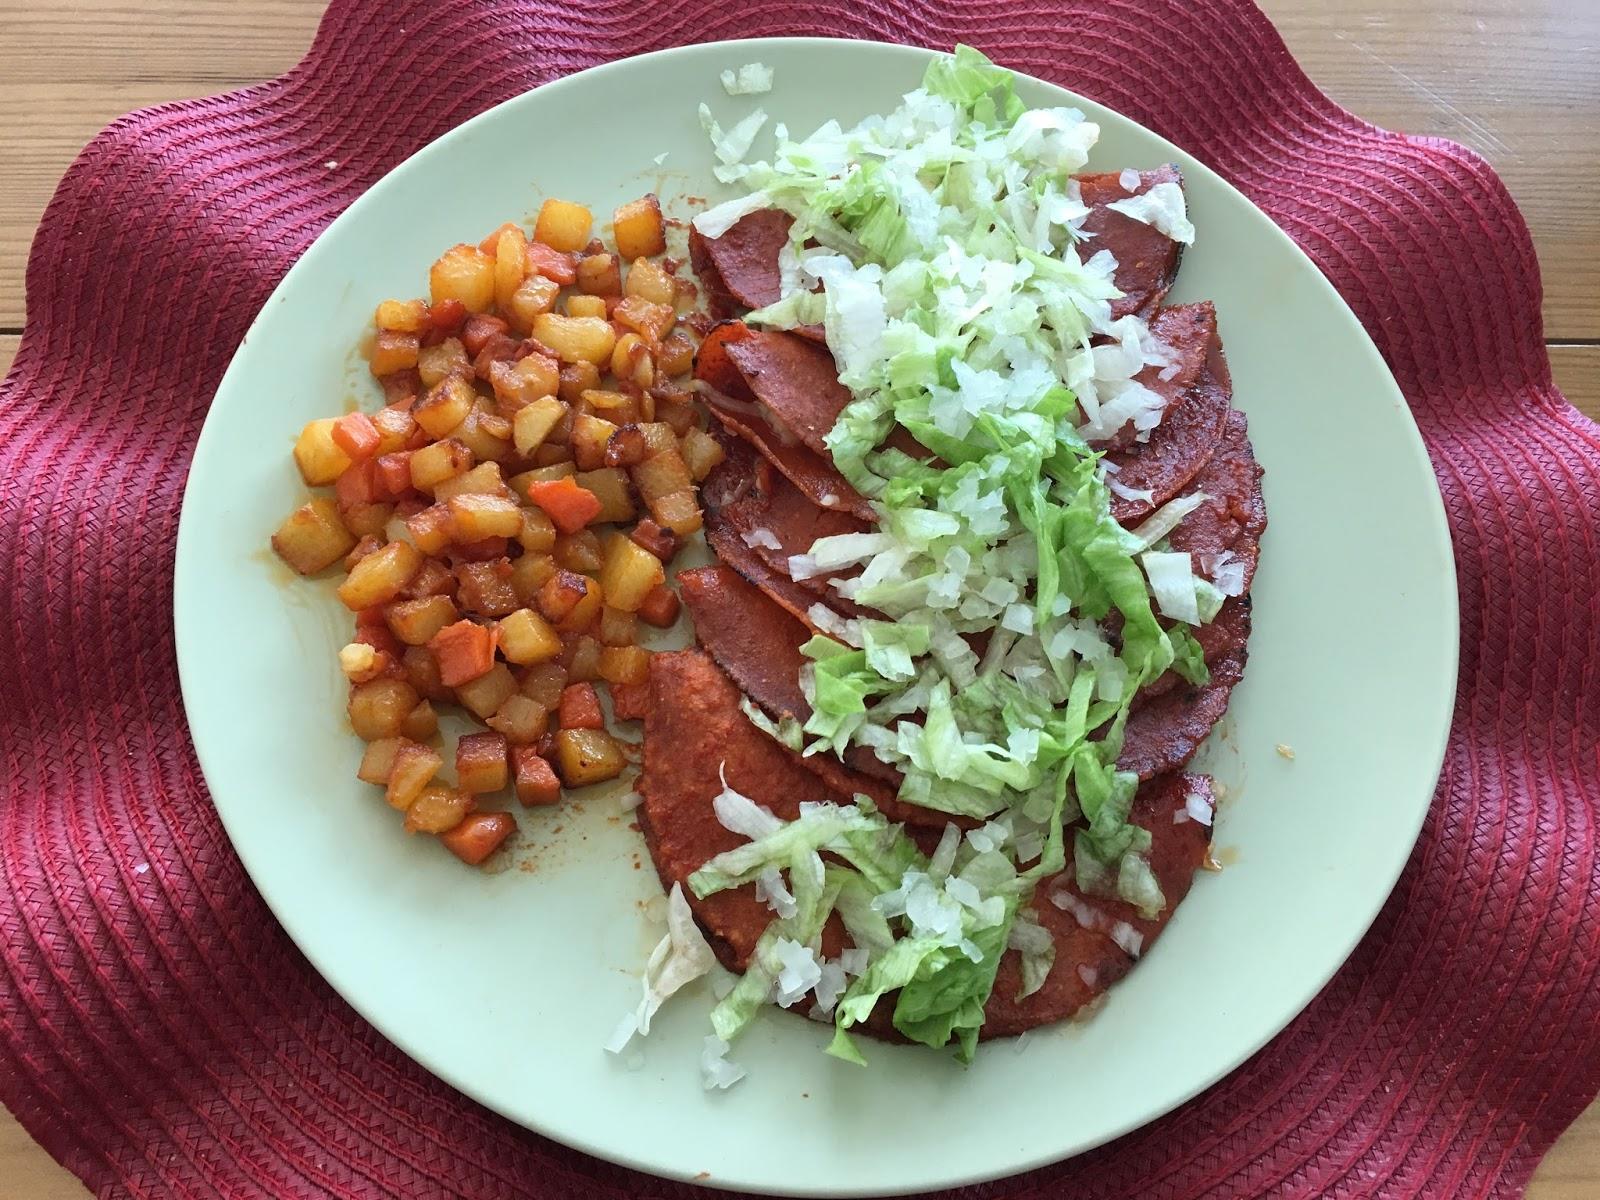 Receta de Enchiladas Potosinas - Del Plato a la Boca